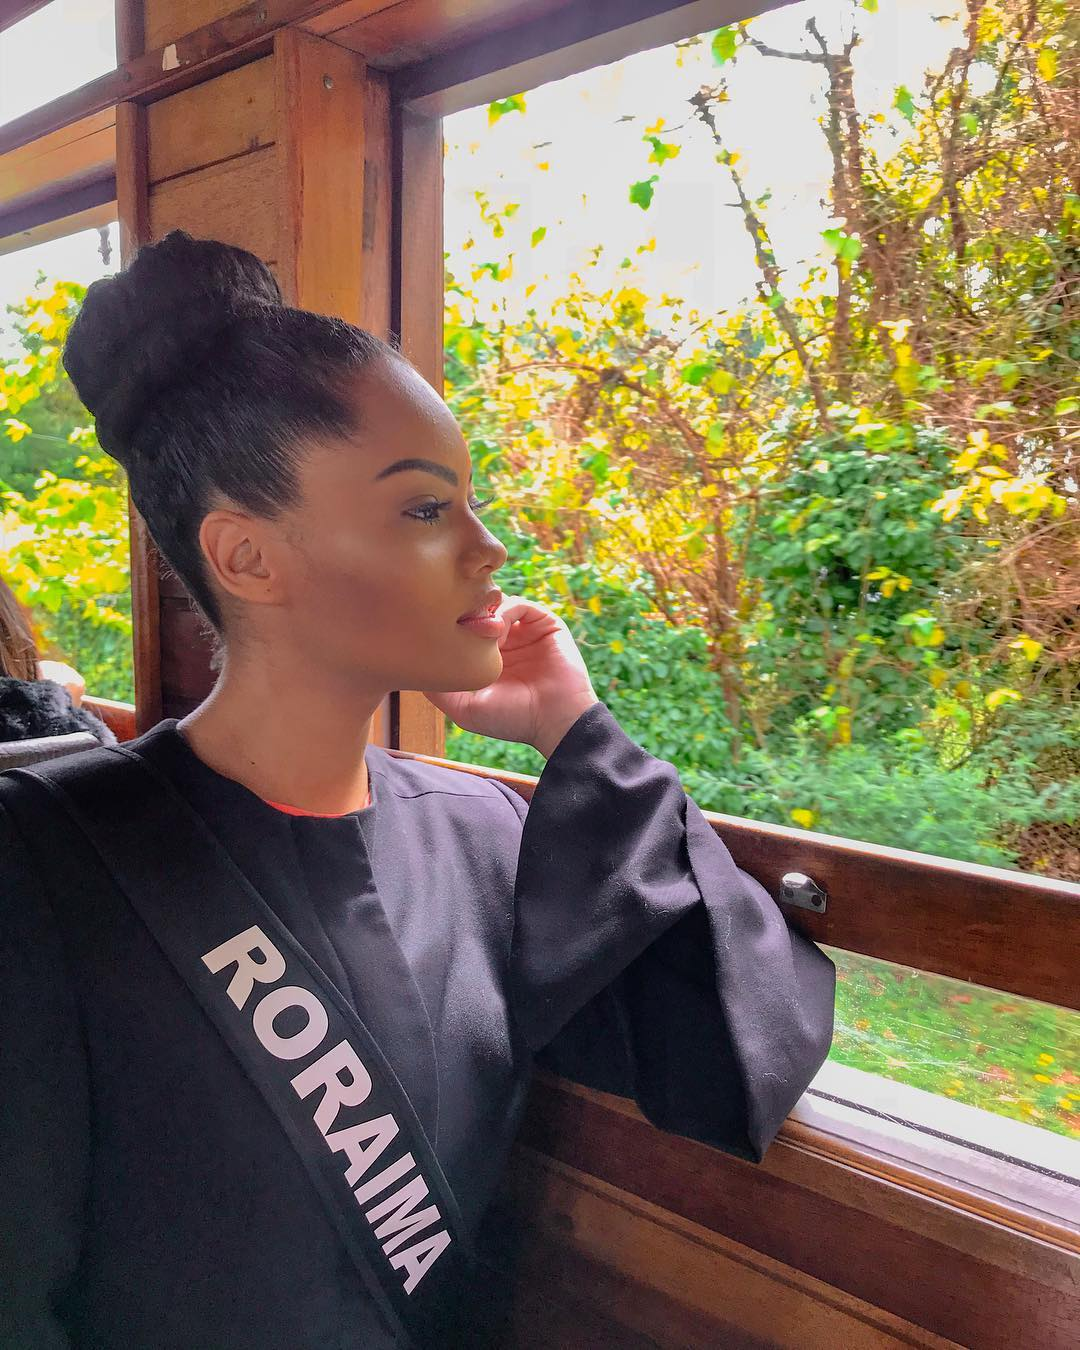 natali vitoria, top 15 de miss brasil universo 2019 /miss brasil teen universe 2017. primeira miss negra a vencer o miss roraima. - Página 11 51858210